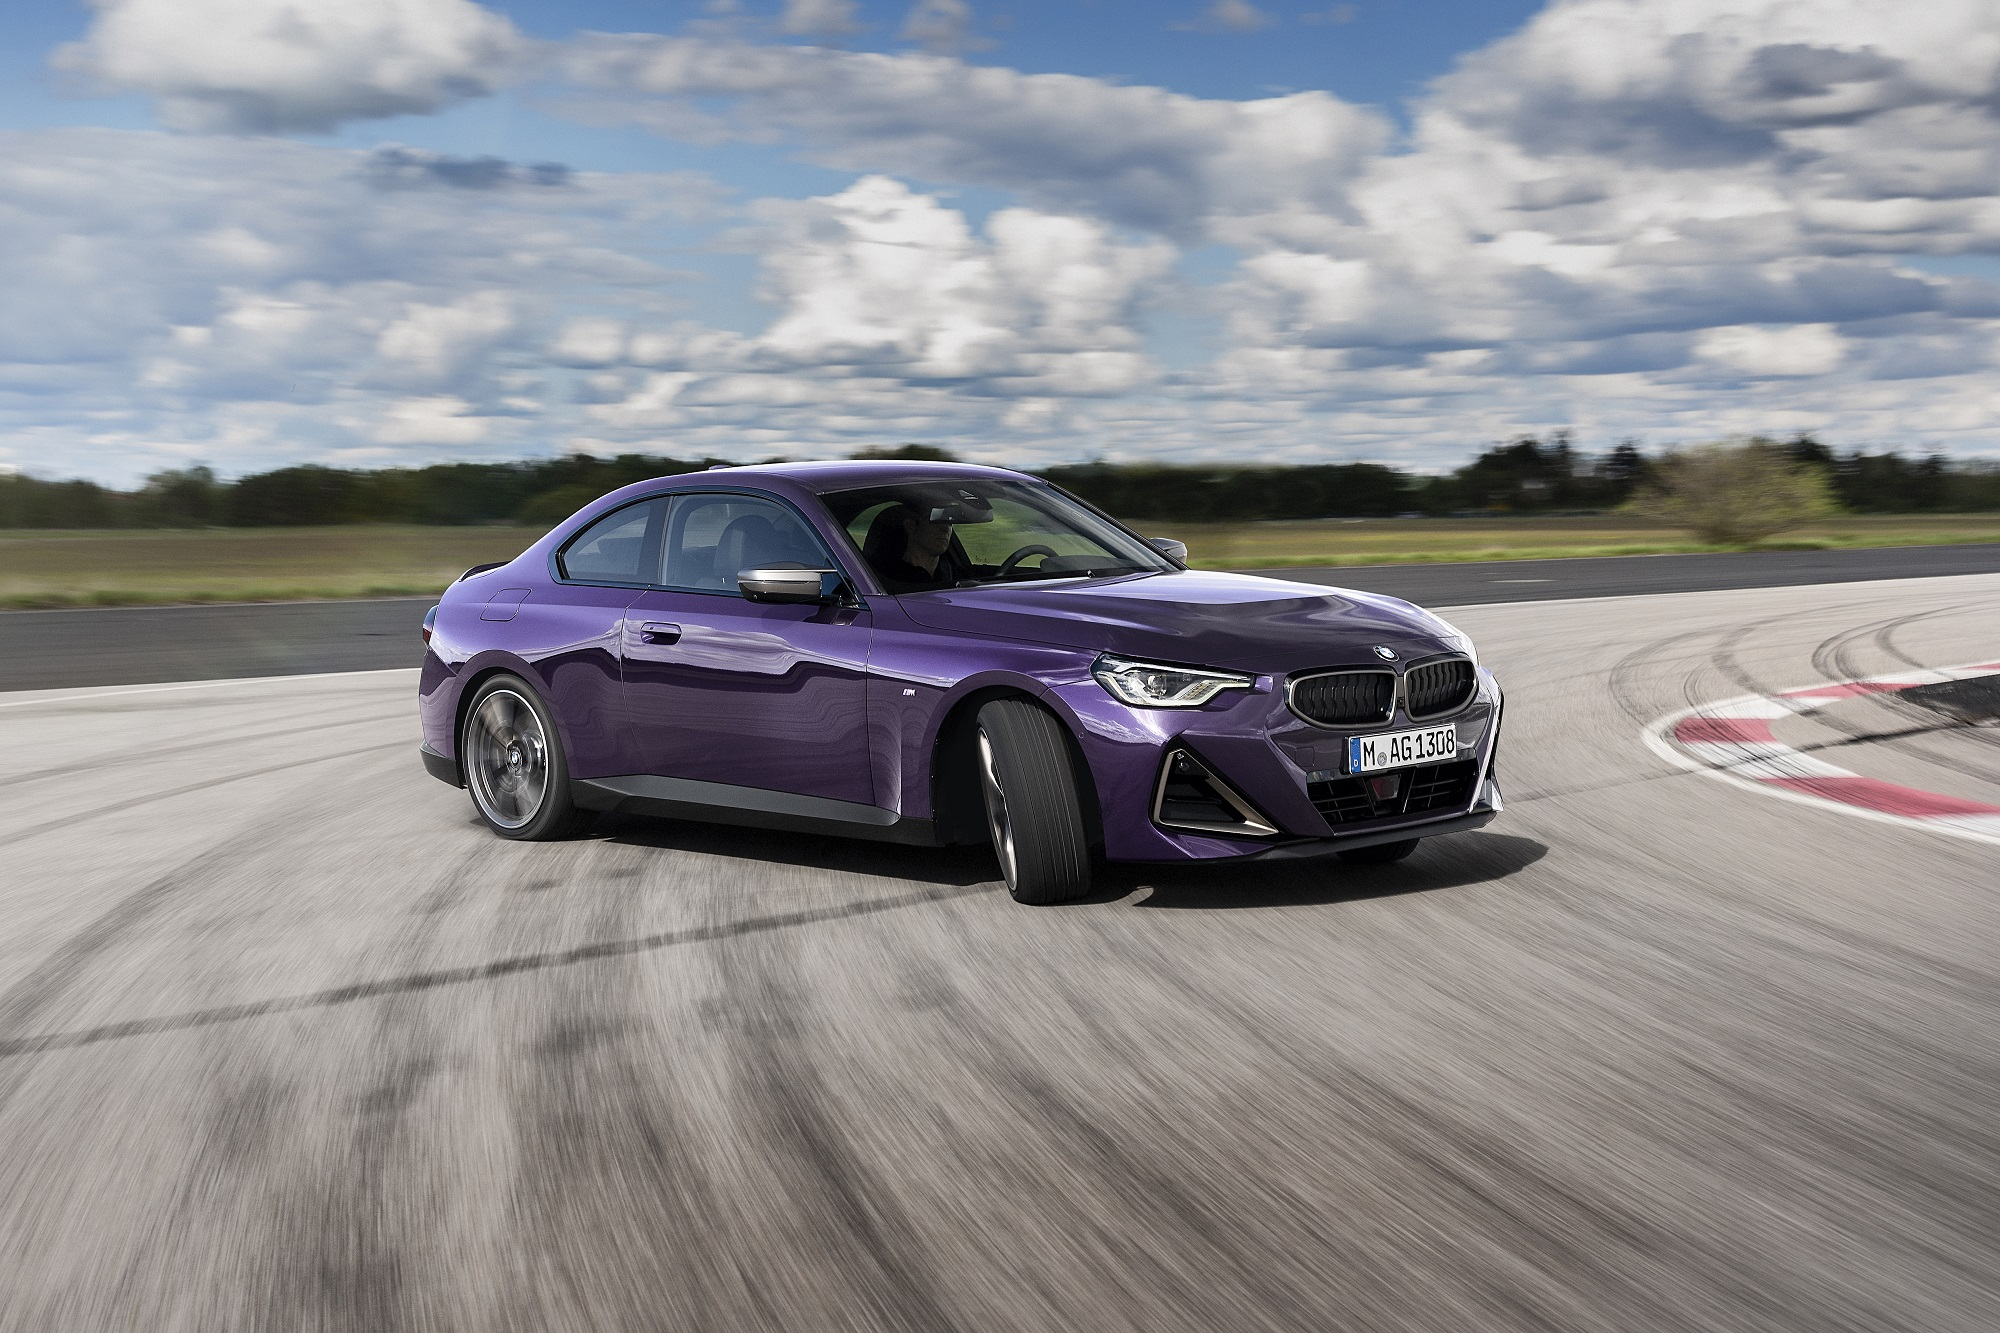 2021 BMW's 240i xDrive: Skyline GTR reincarnated? Here's 7 reasons why we believe so….